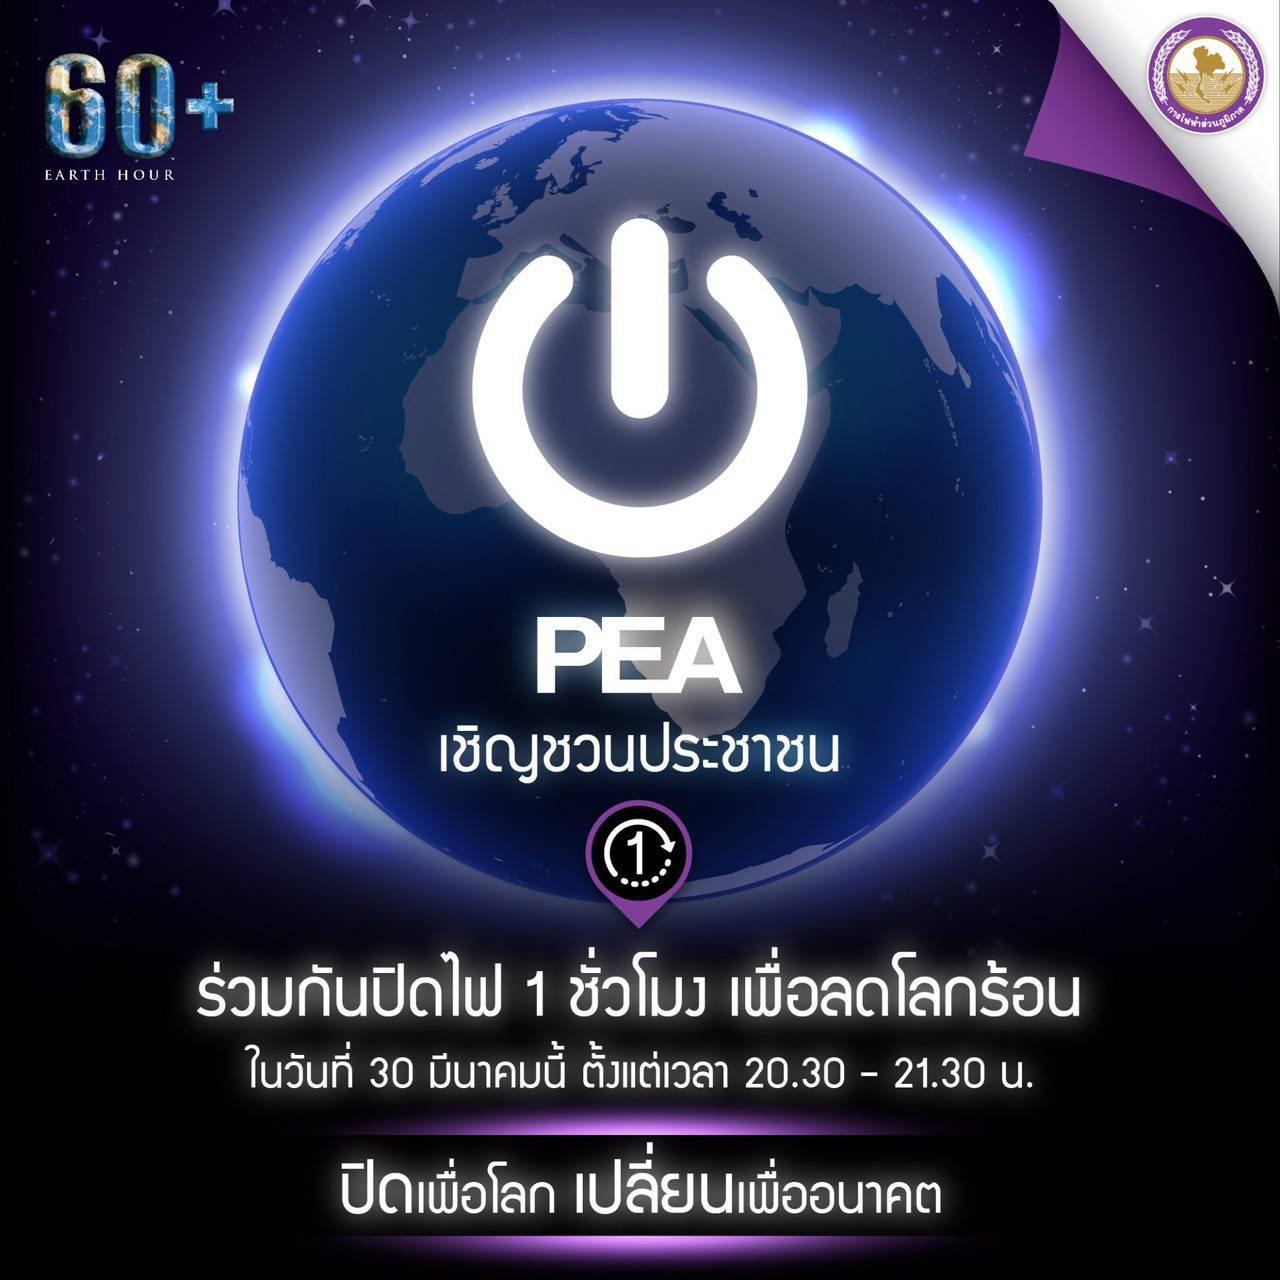 PEA ขอเชิญรวมพลัง ปิดไฟ 1 ชั่วโมง เพื่อลดโลกร้อน วันที่ 30 มีนาคม 2562 เวลา 20.30 - 21.30 น.